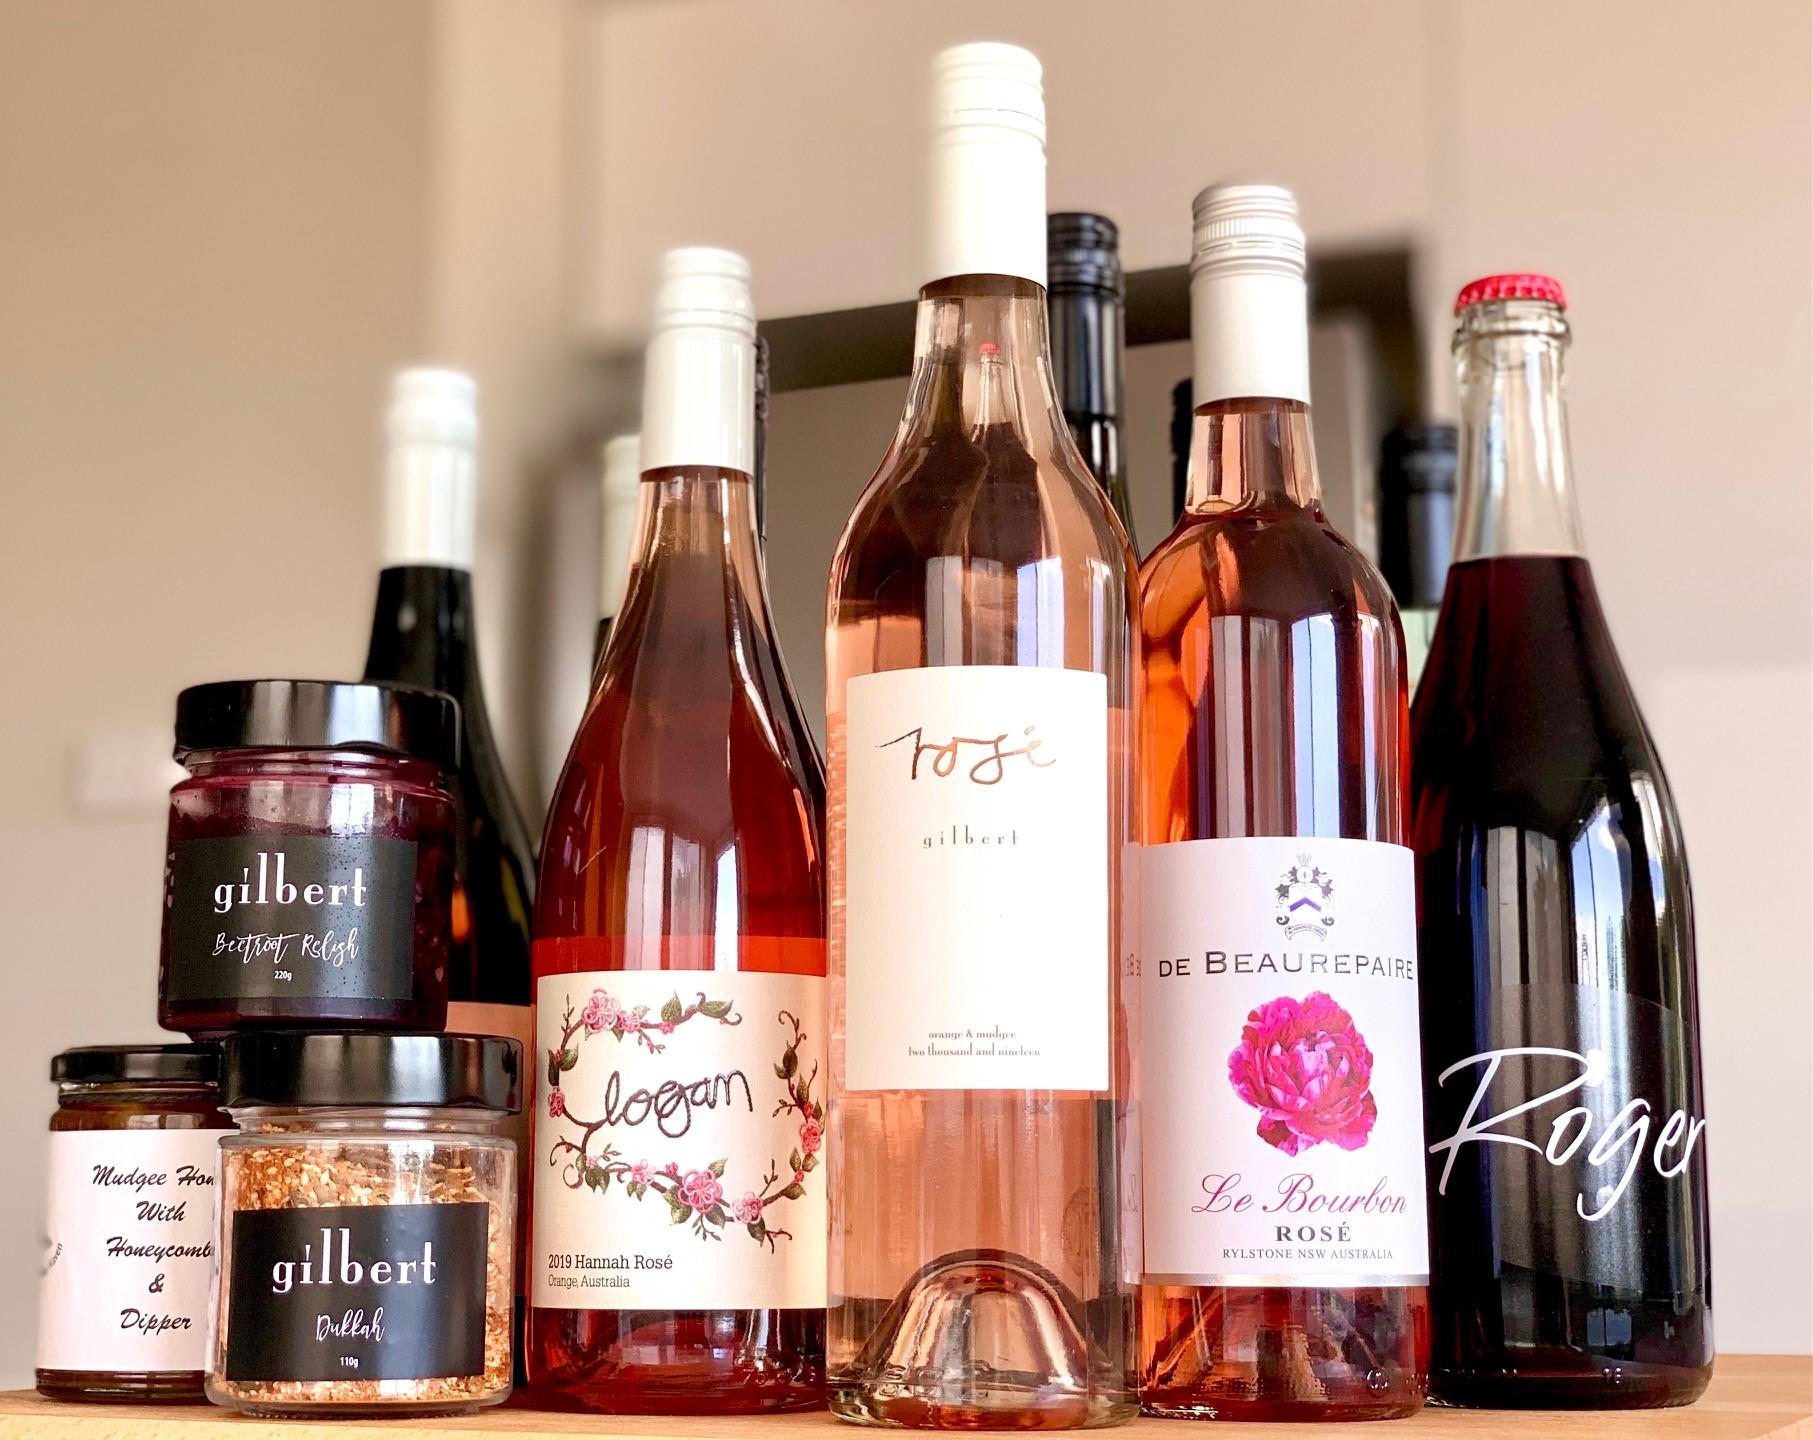 Visit The Best Wineries & Cellar Doors in Mudgee - Giddy Guest